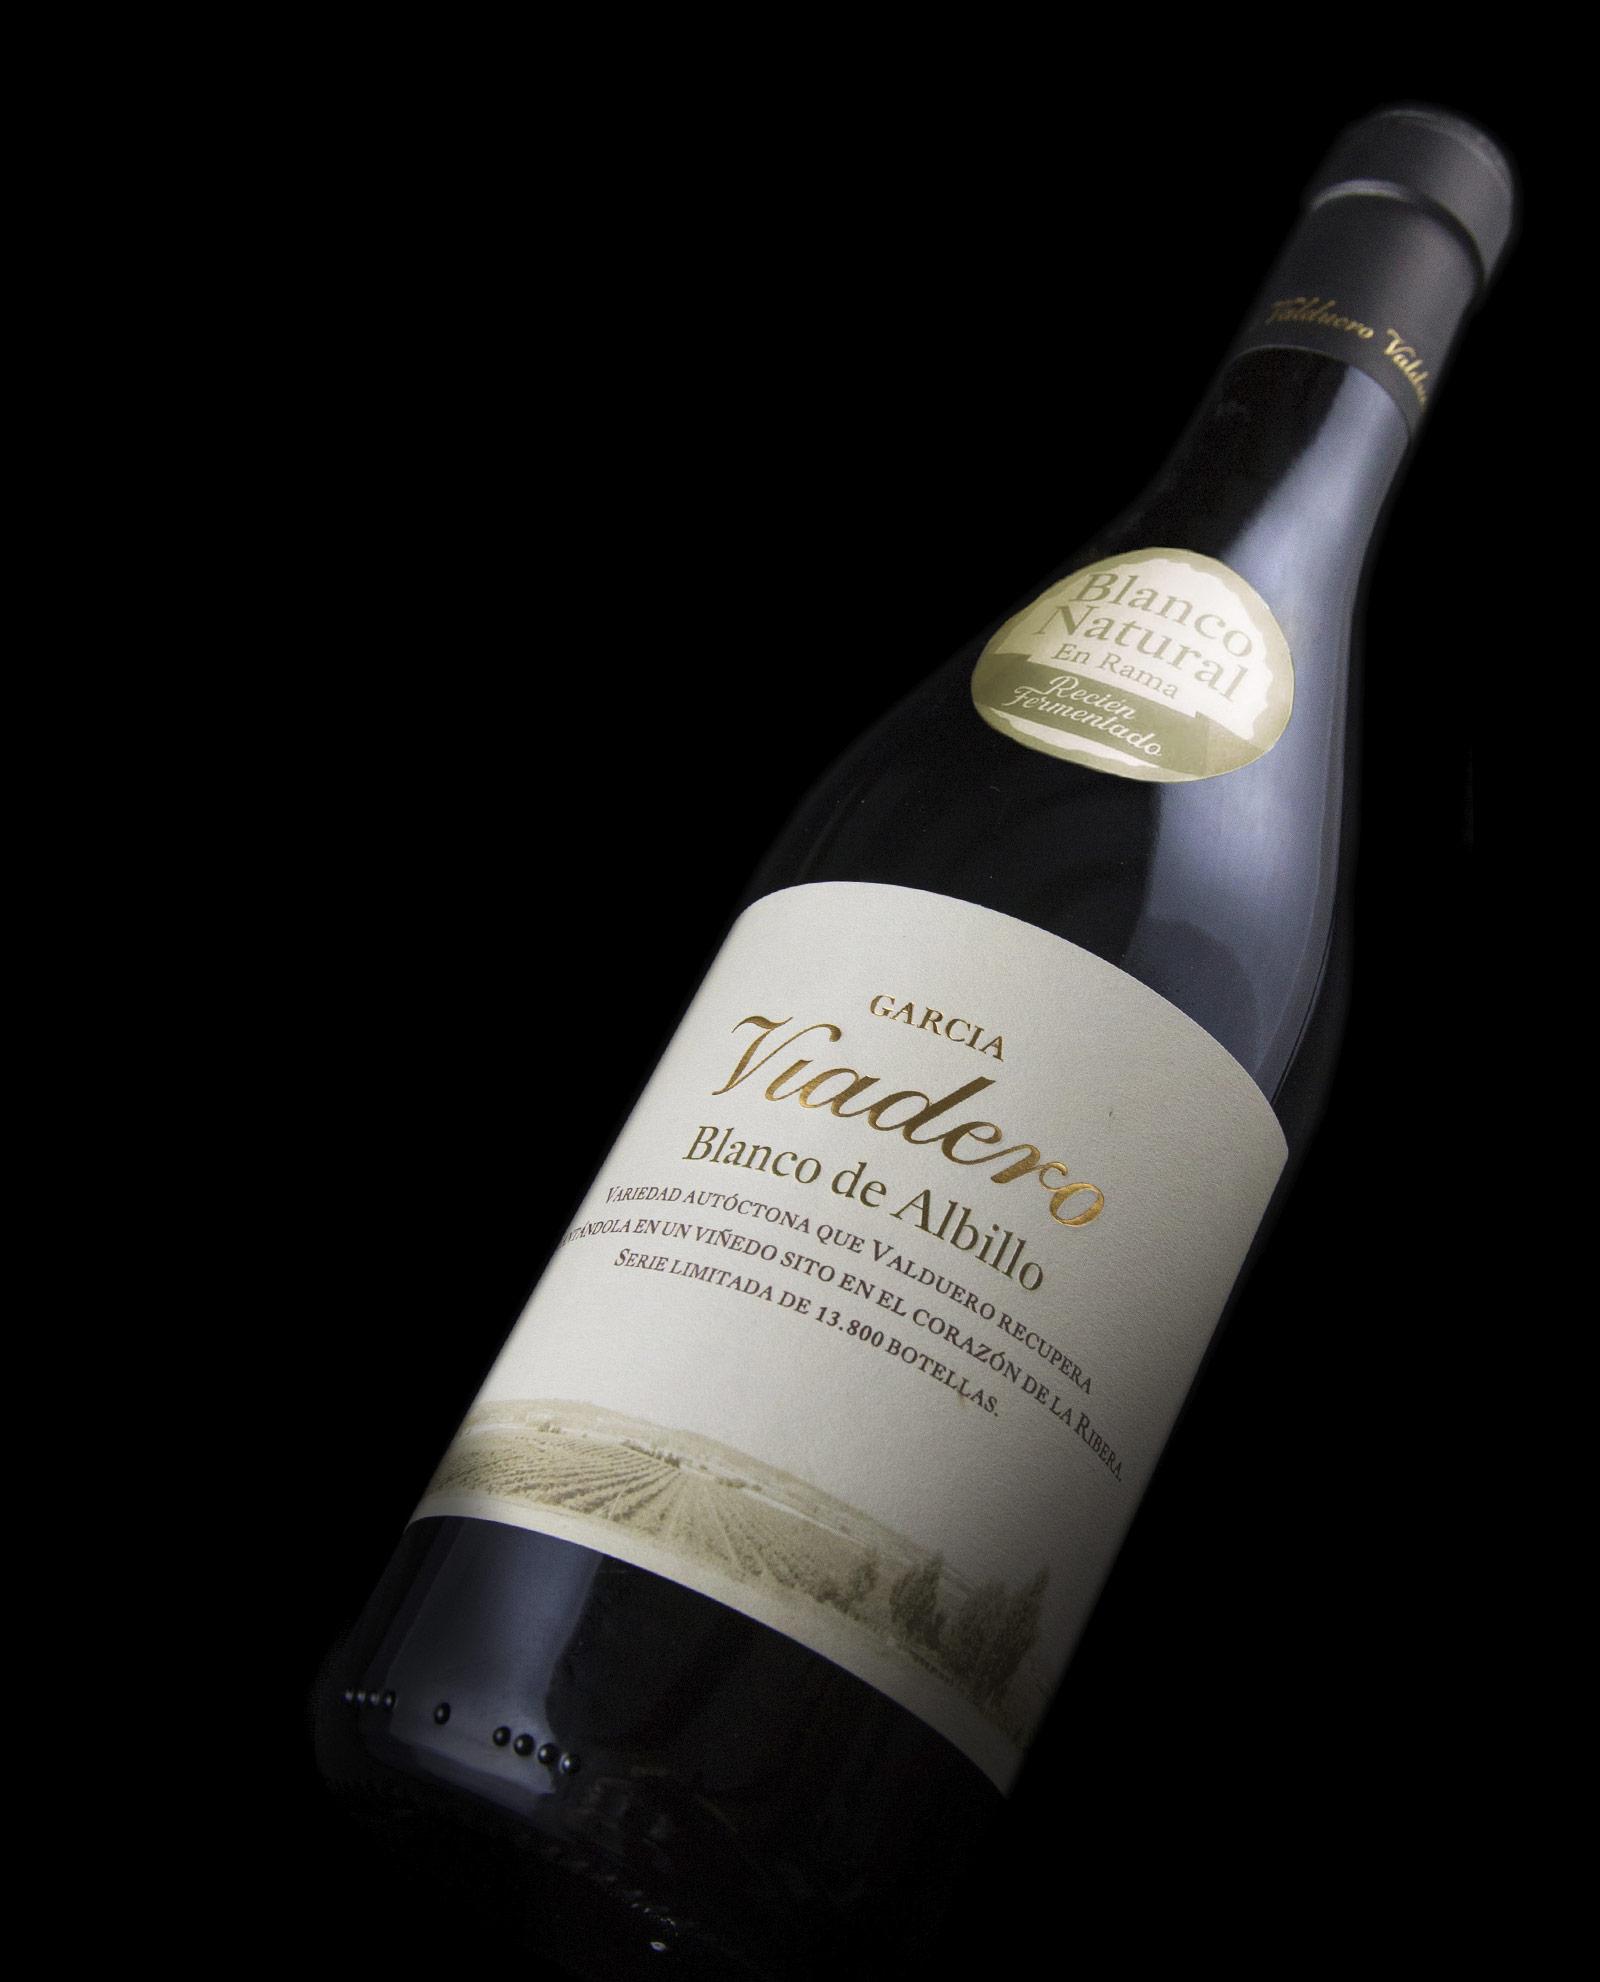 Detalle de la Botella de vIno blanco García Viadero